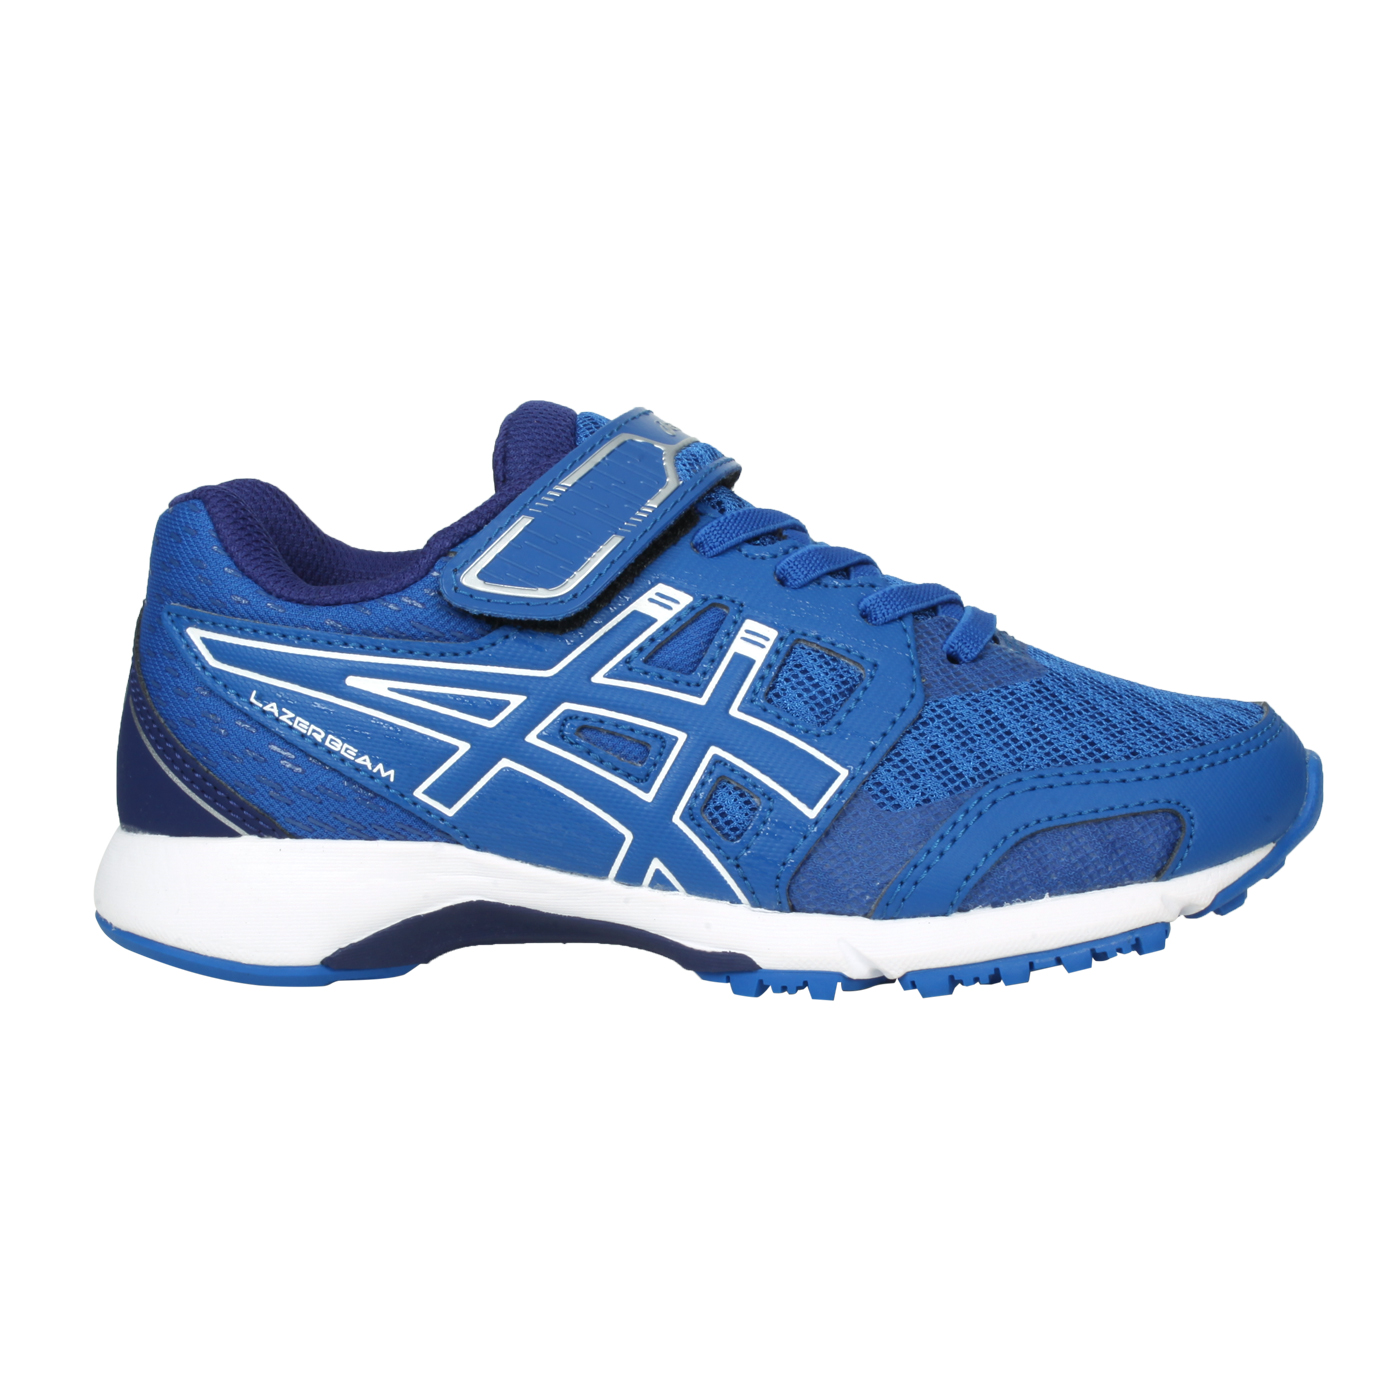 ASICS 中童慢跑鞋  @LAZERBEAM RF-MG@1154A088-402 - 藍白